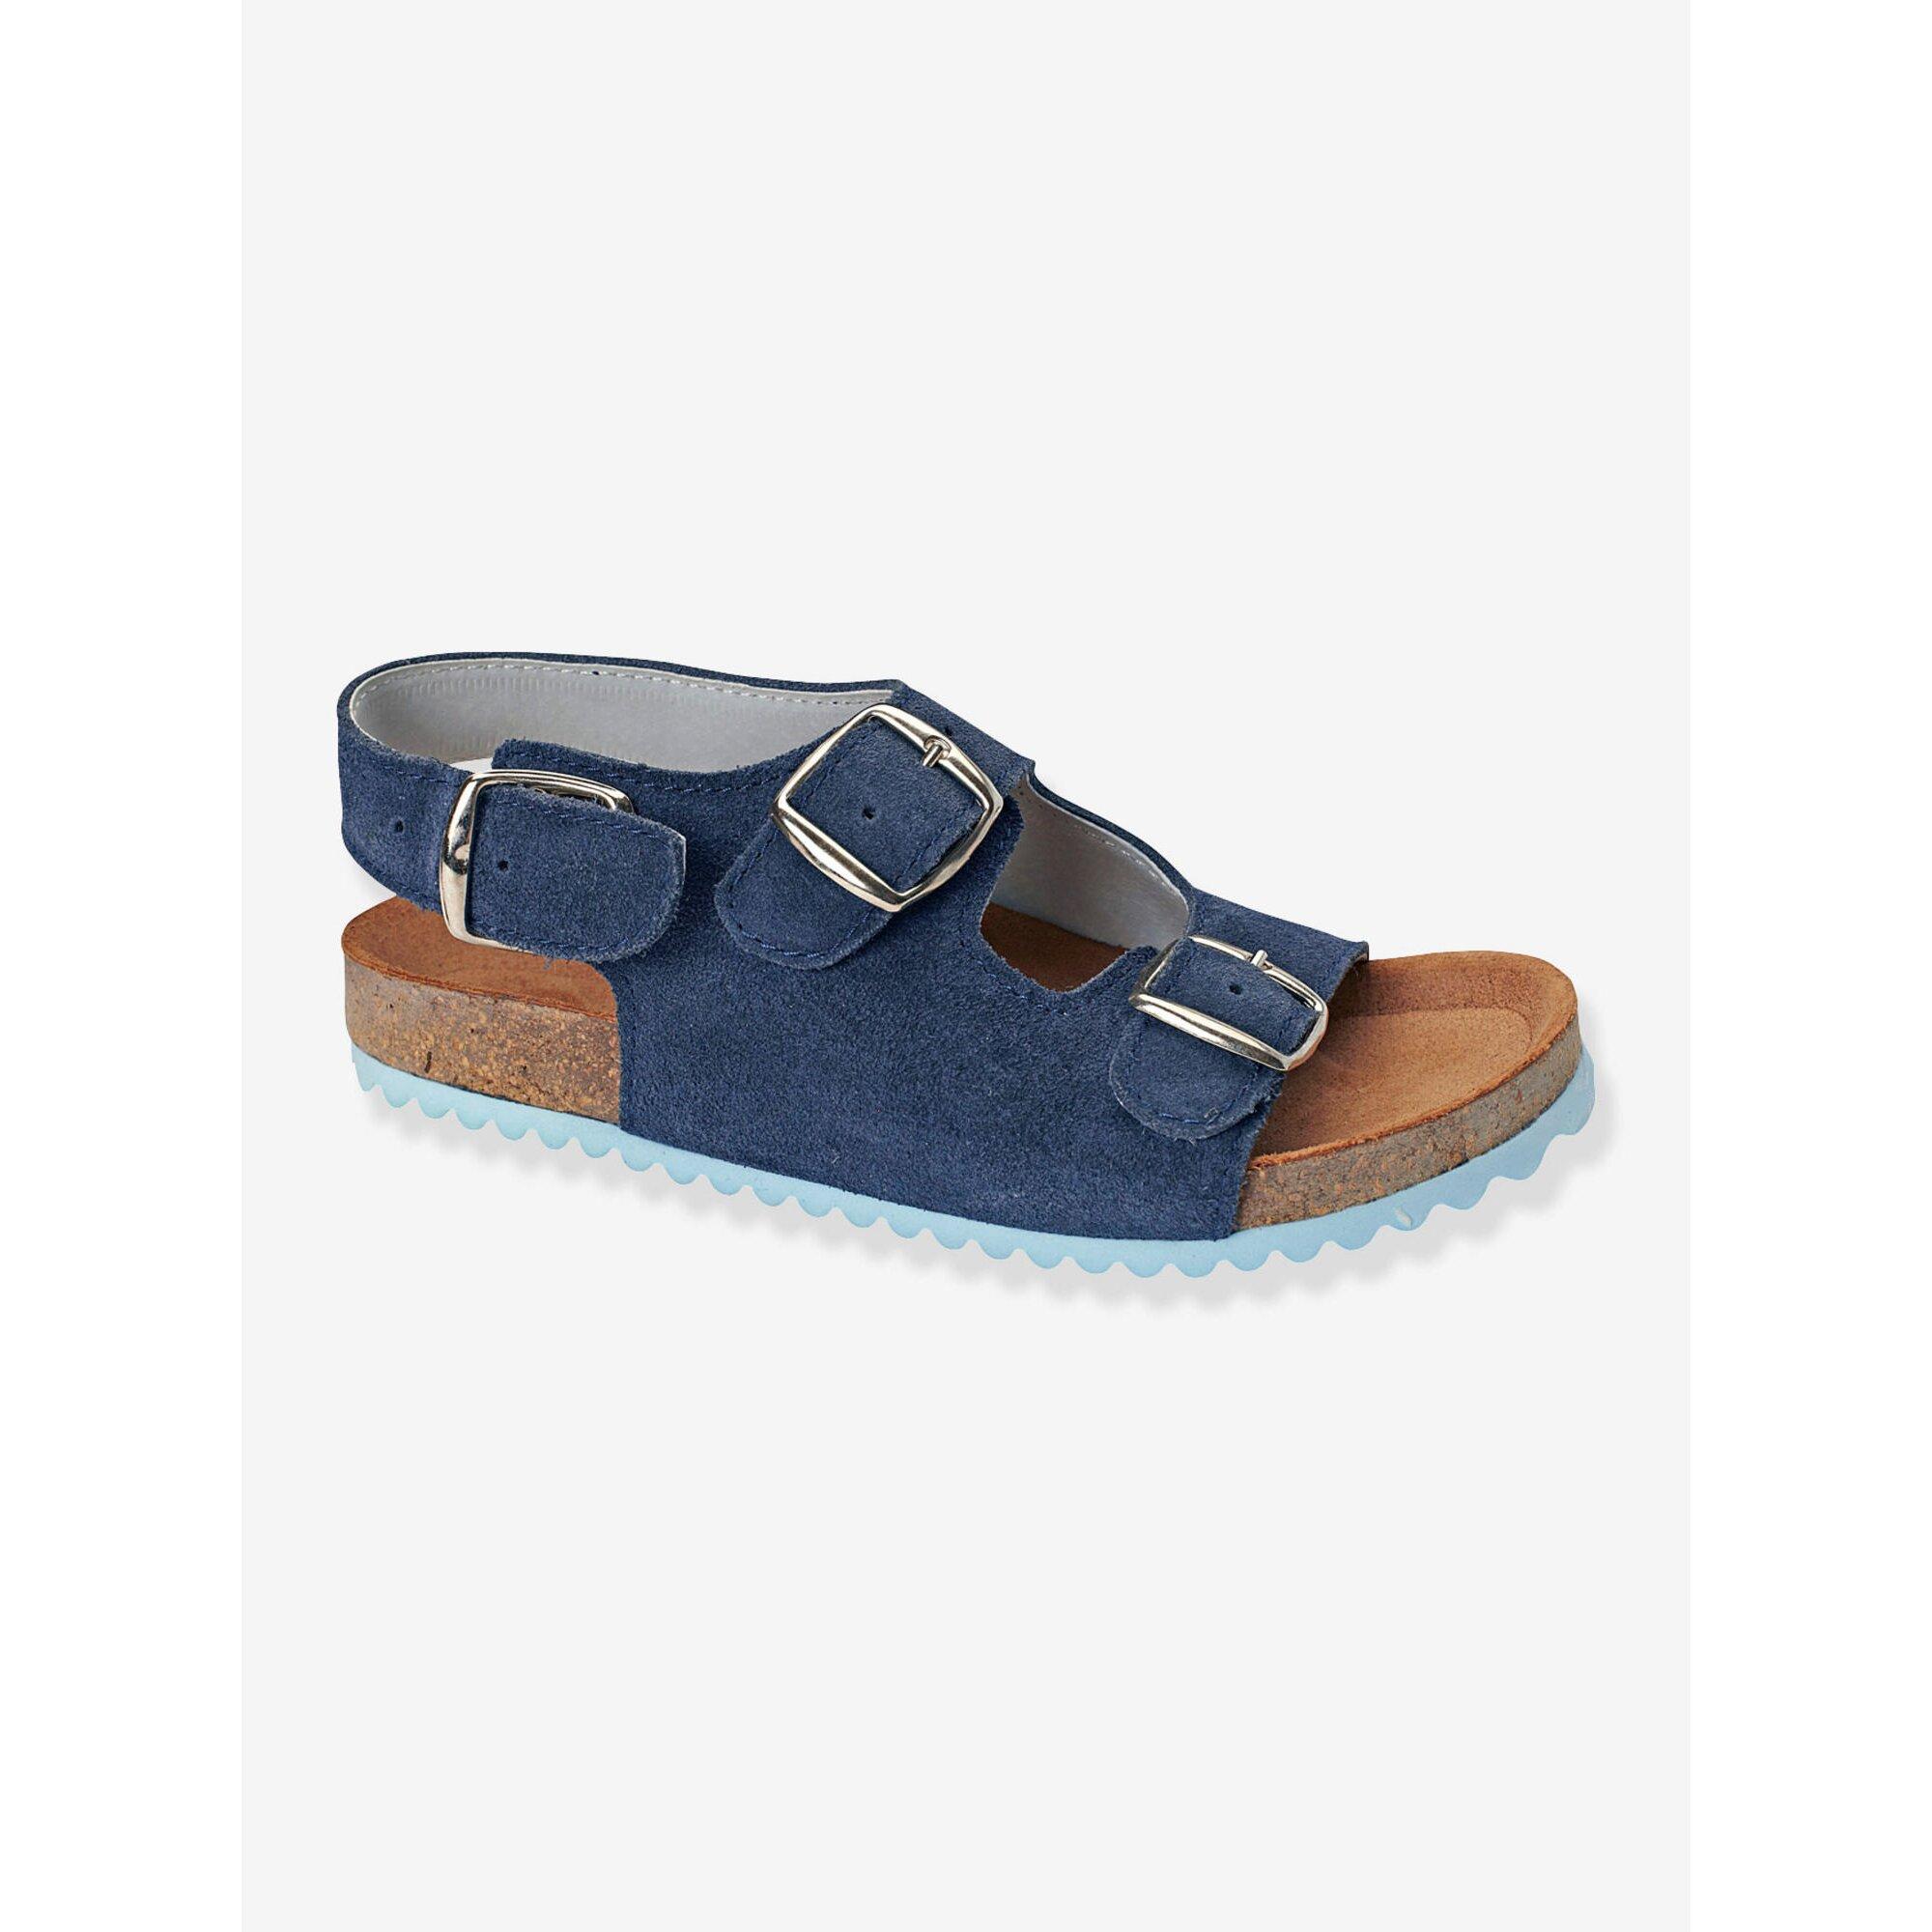 Vertbaudet Sandalen für Jungen Leder